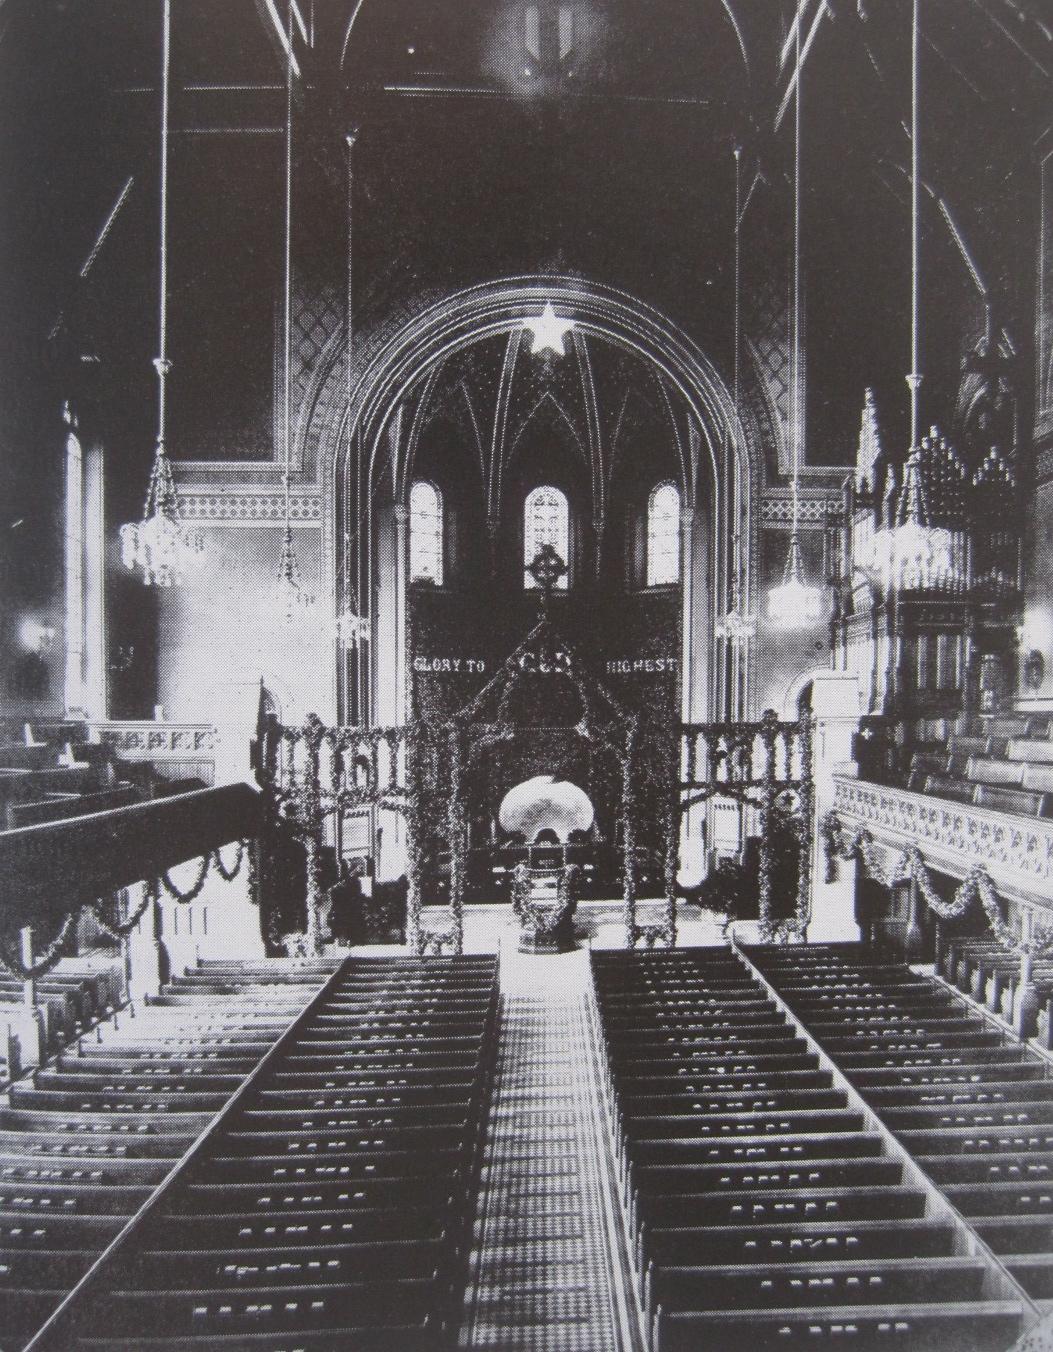 St. George's interior